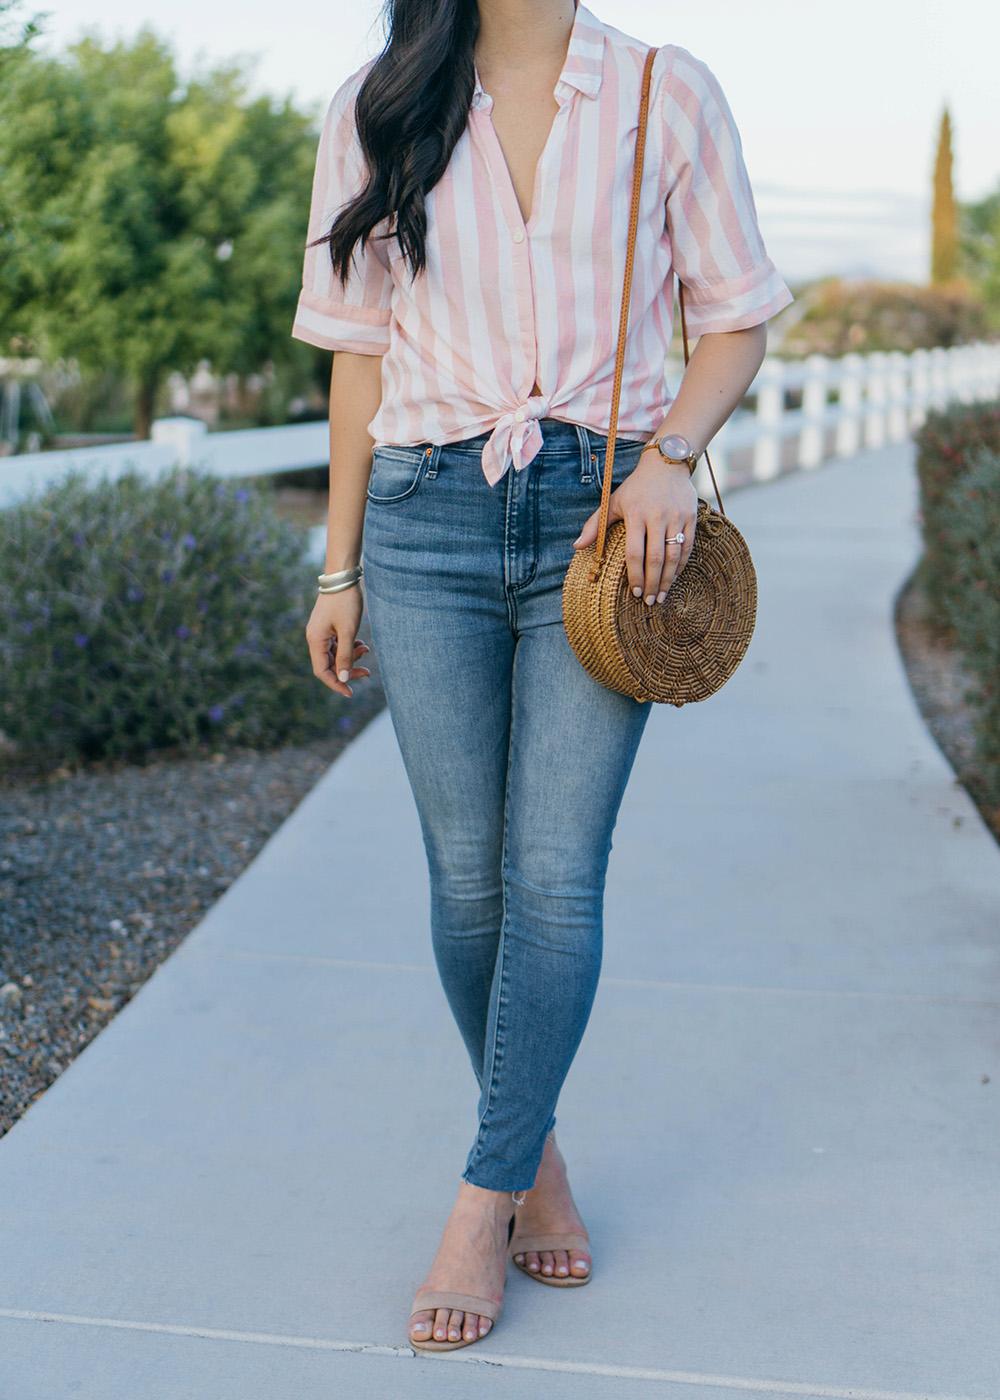 Spring Style Inspiration / Striped Shirt & Skinny Jeans